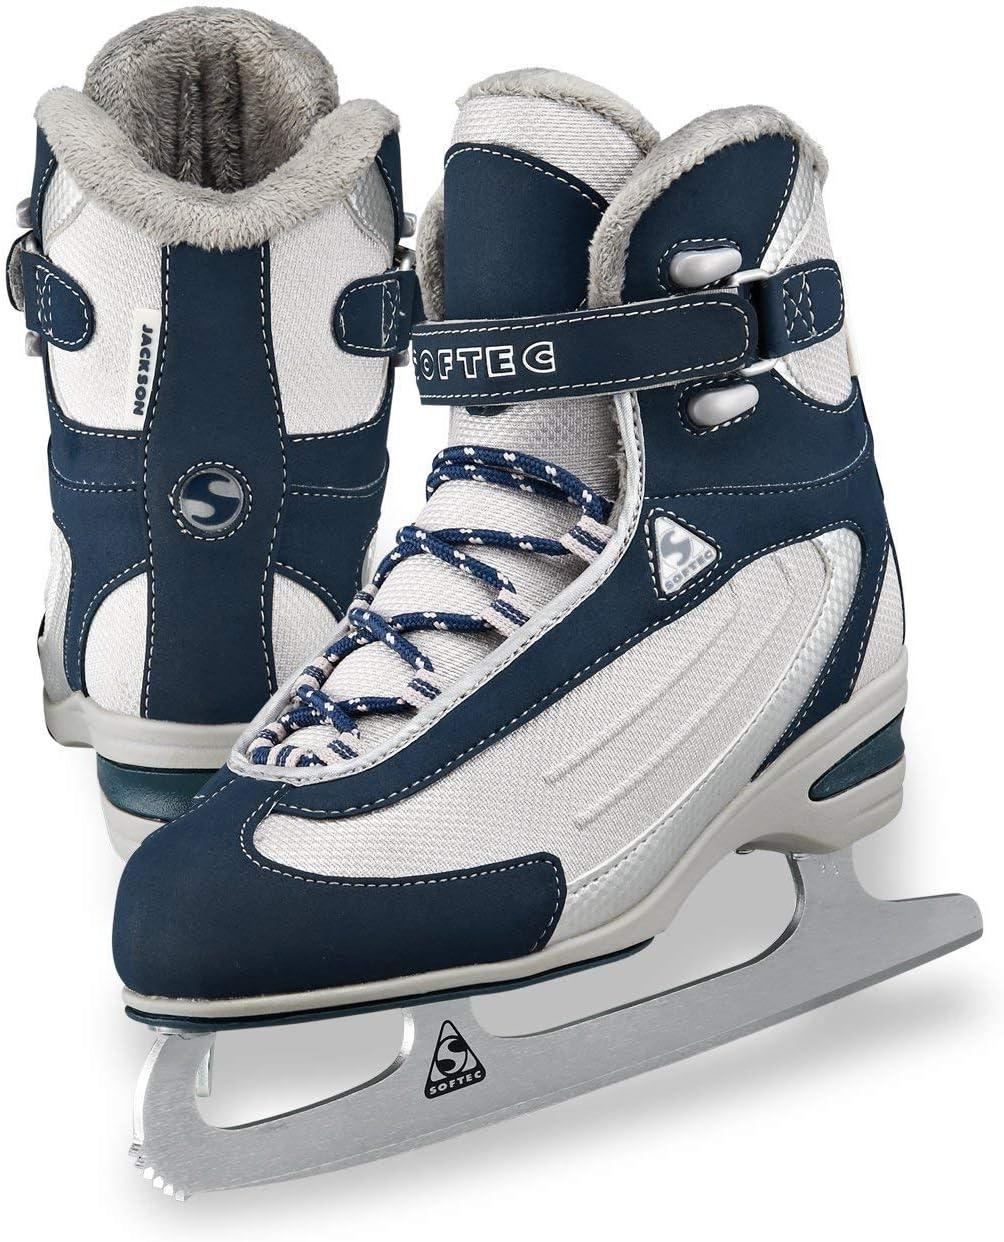 k2 raider boy's Ice Skate